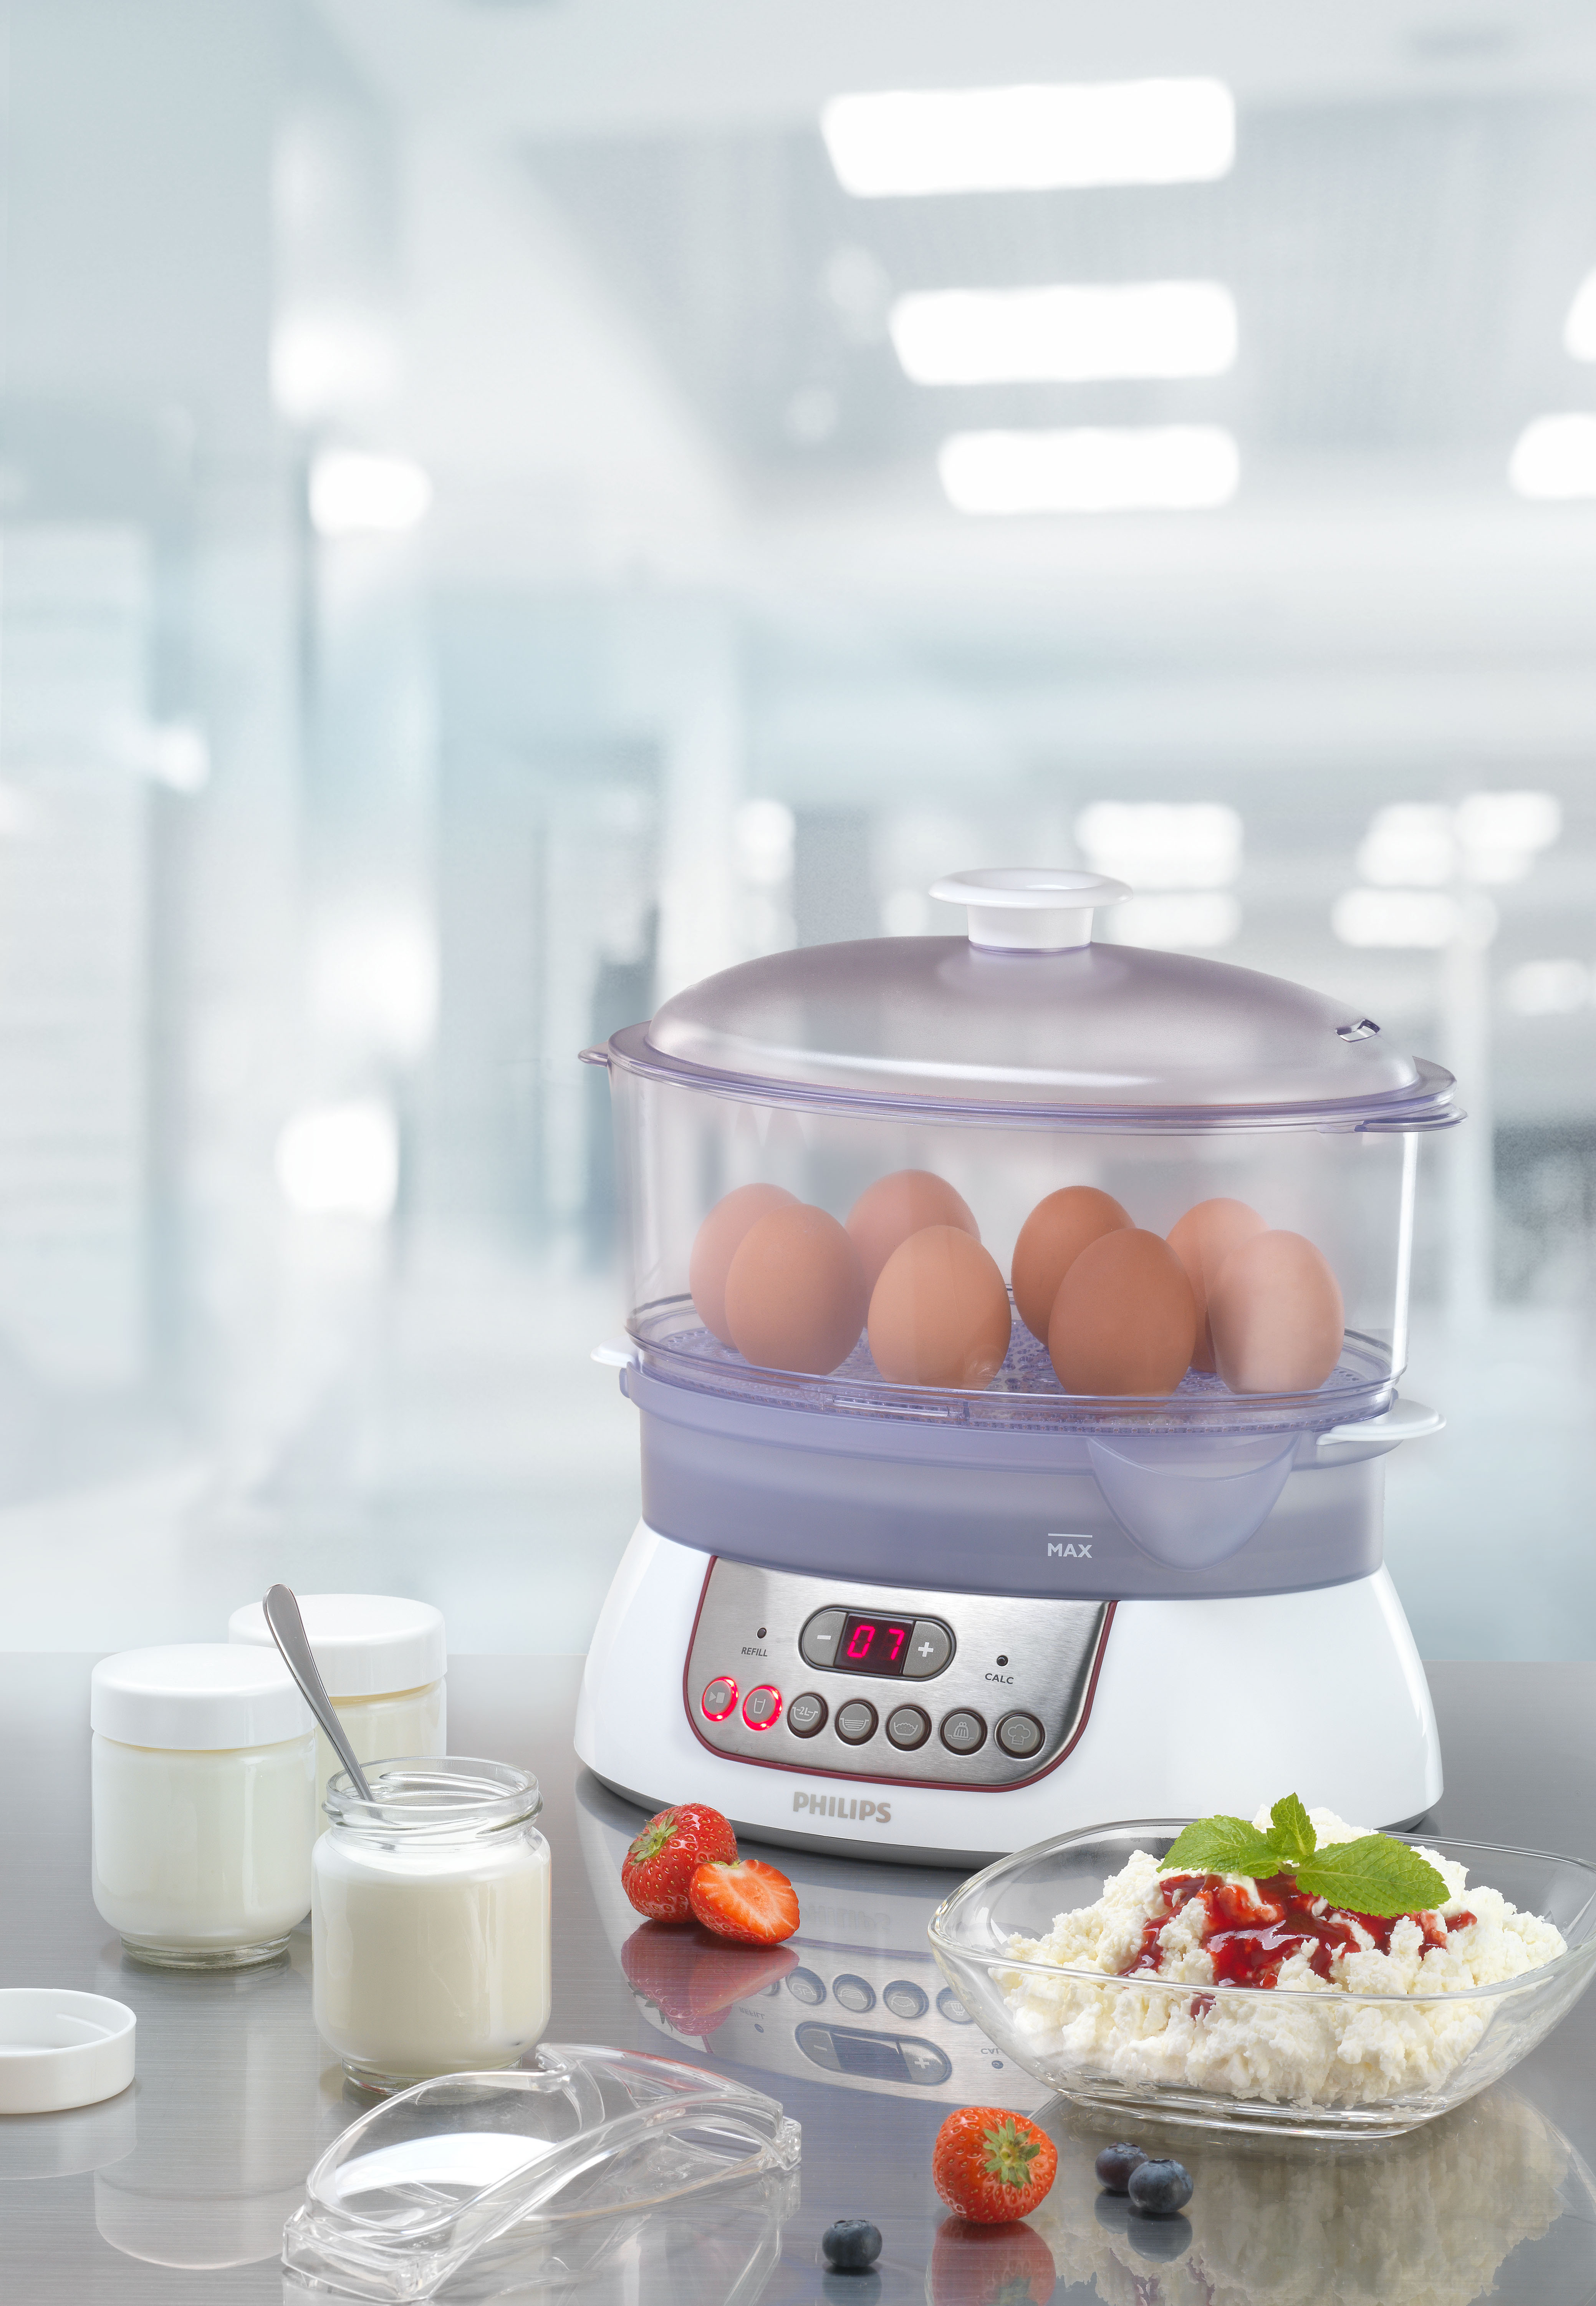 Philips Yogurt Maker HD9141